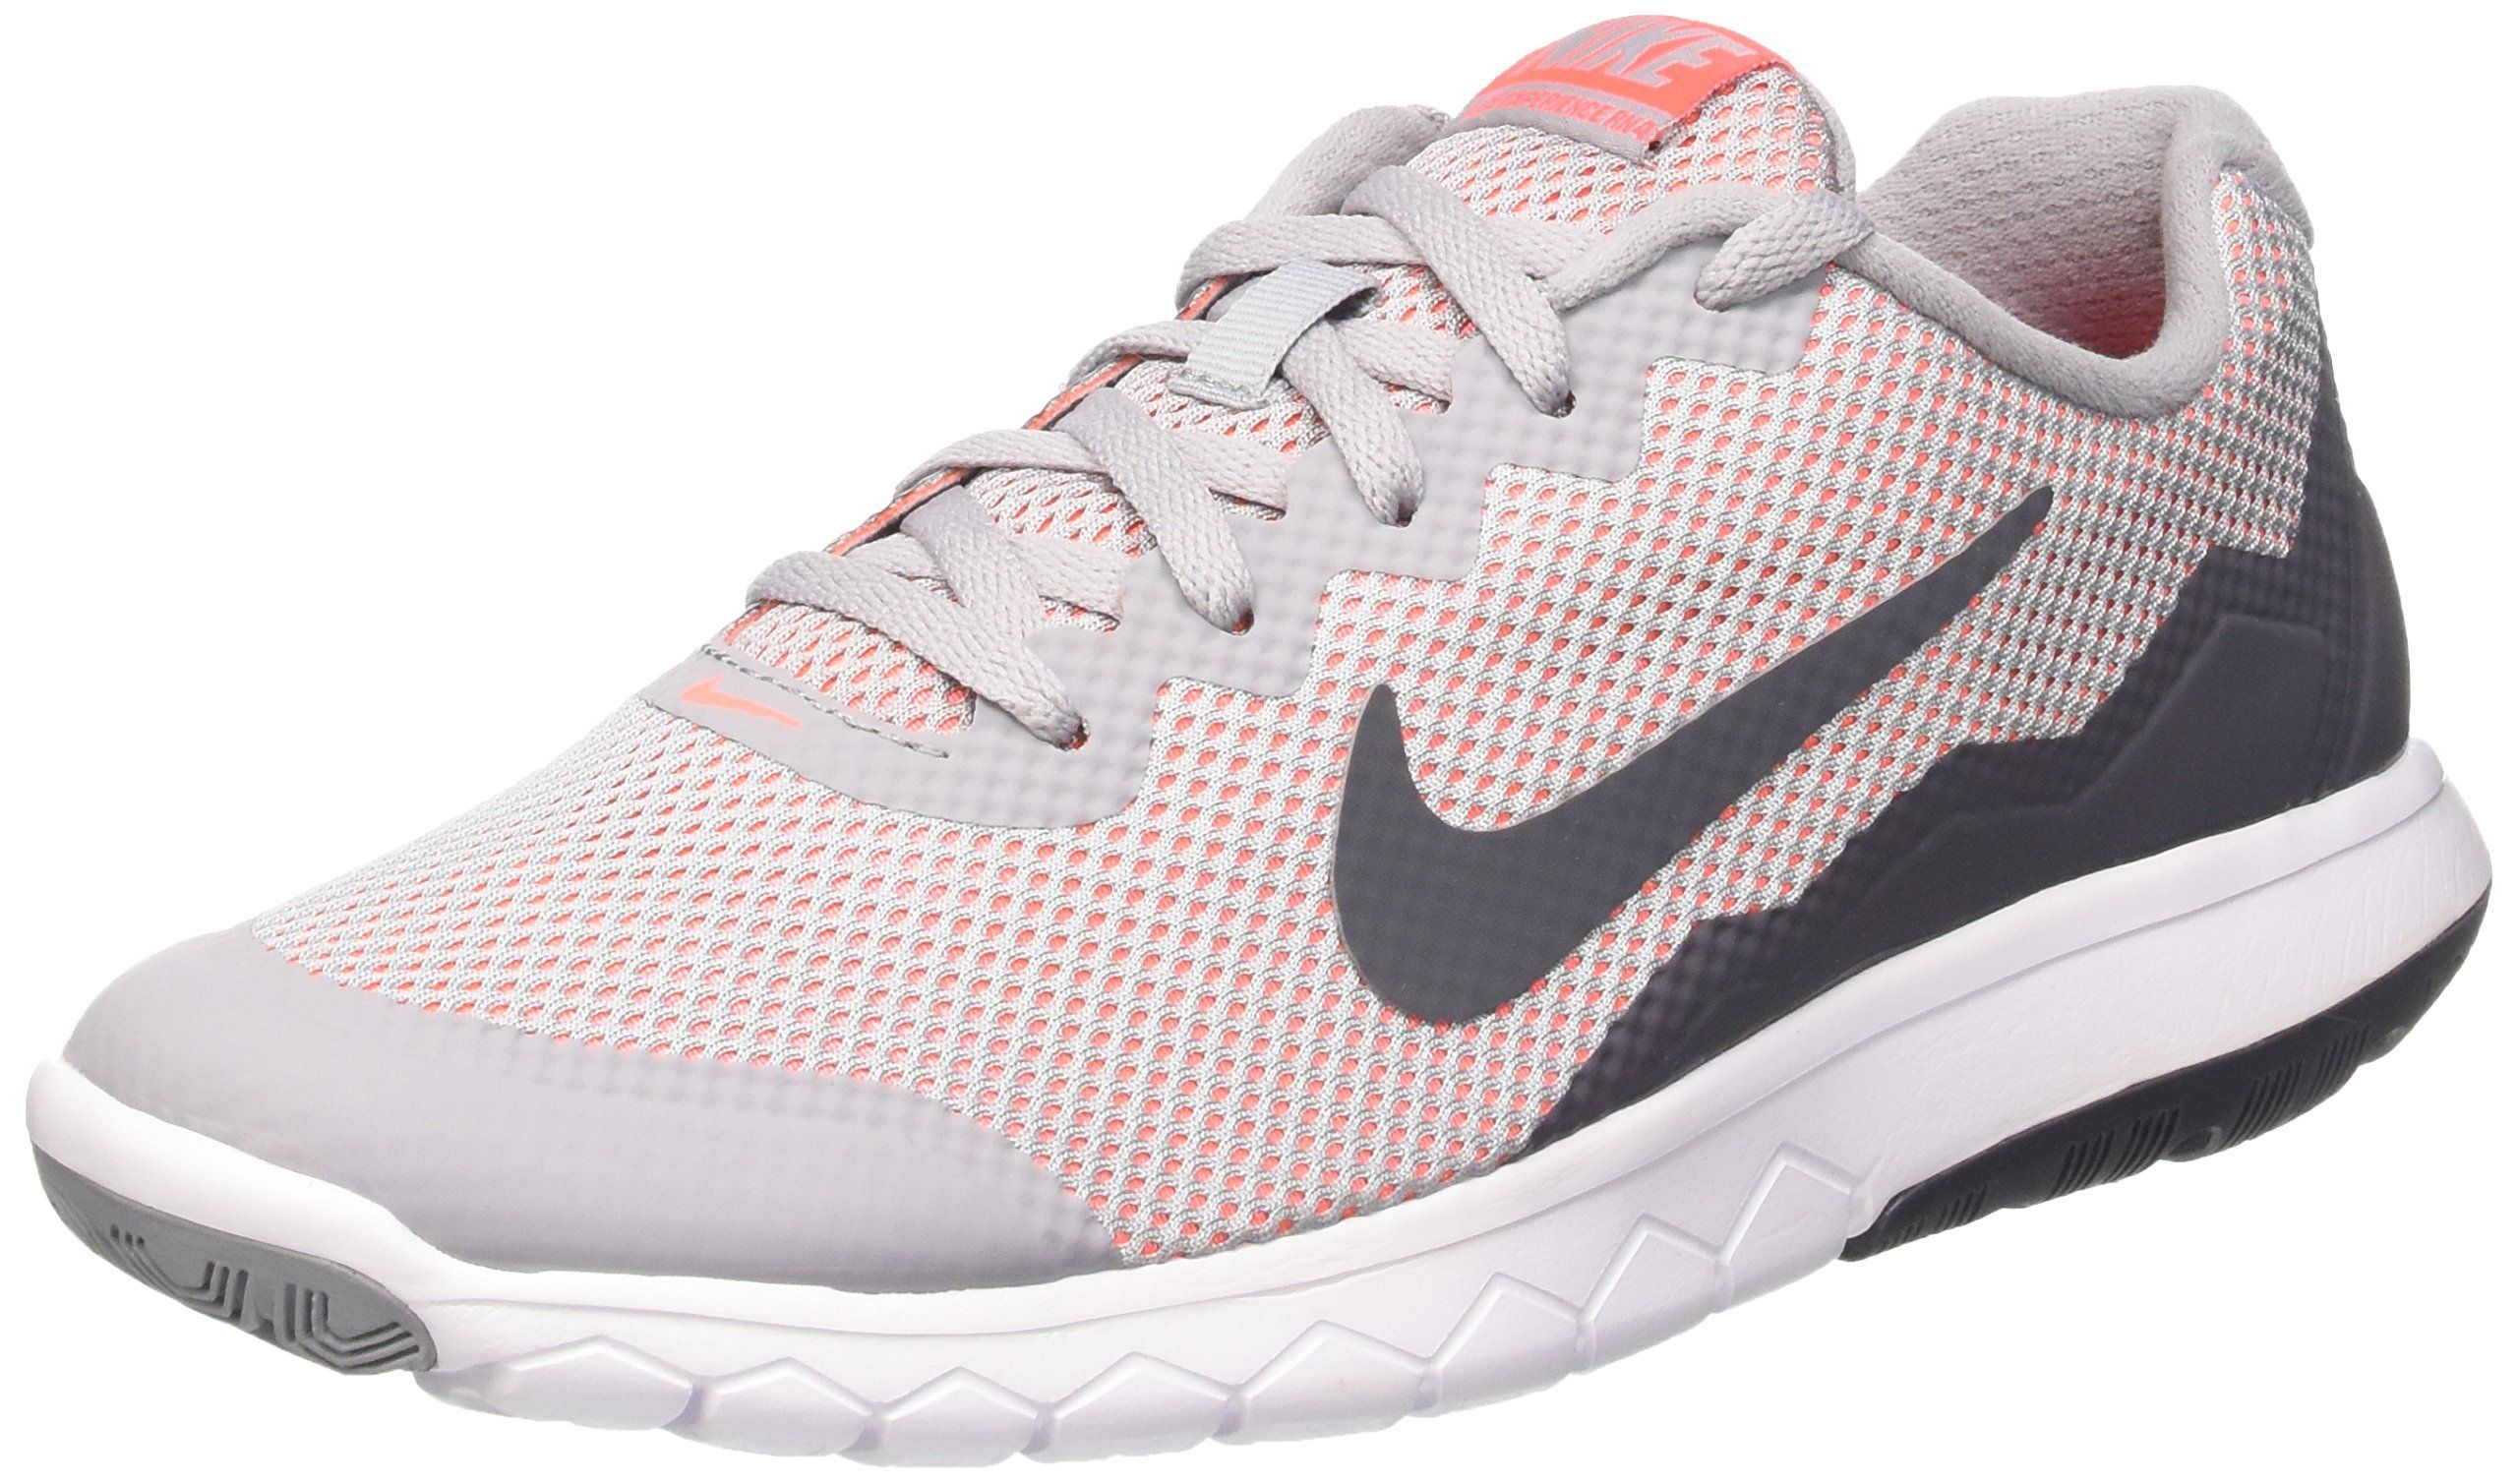 Nouveaux produits b534e d81b2 Nike Men's Flex Experience RN (Grey) Running Shoe, 8 B(M) US ...